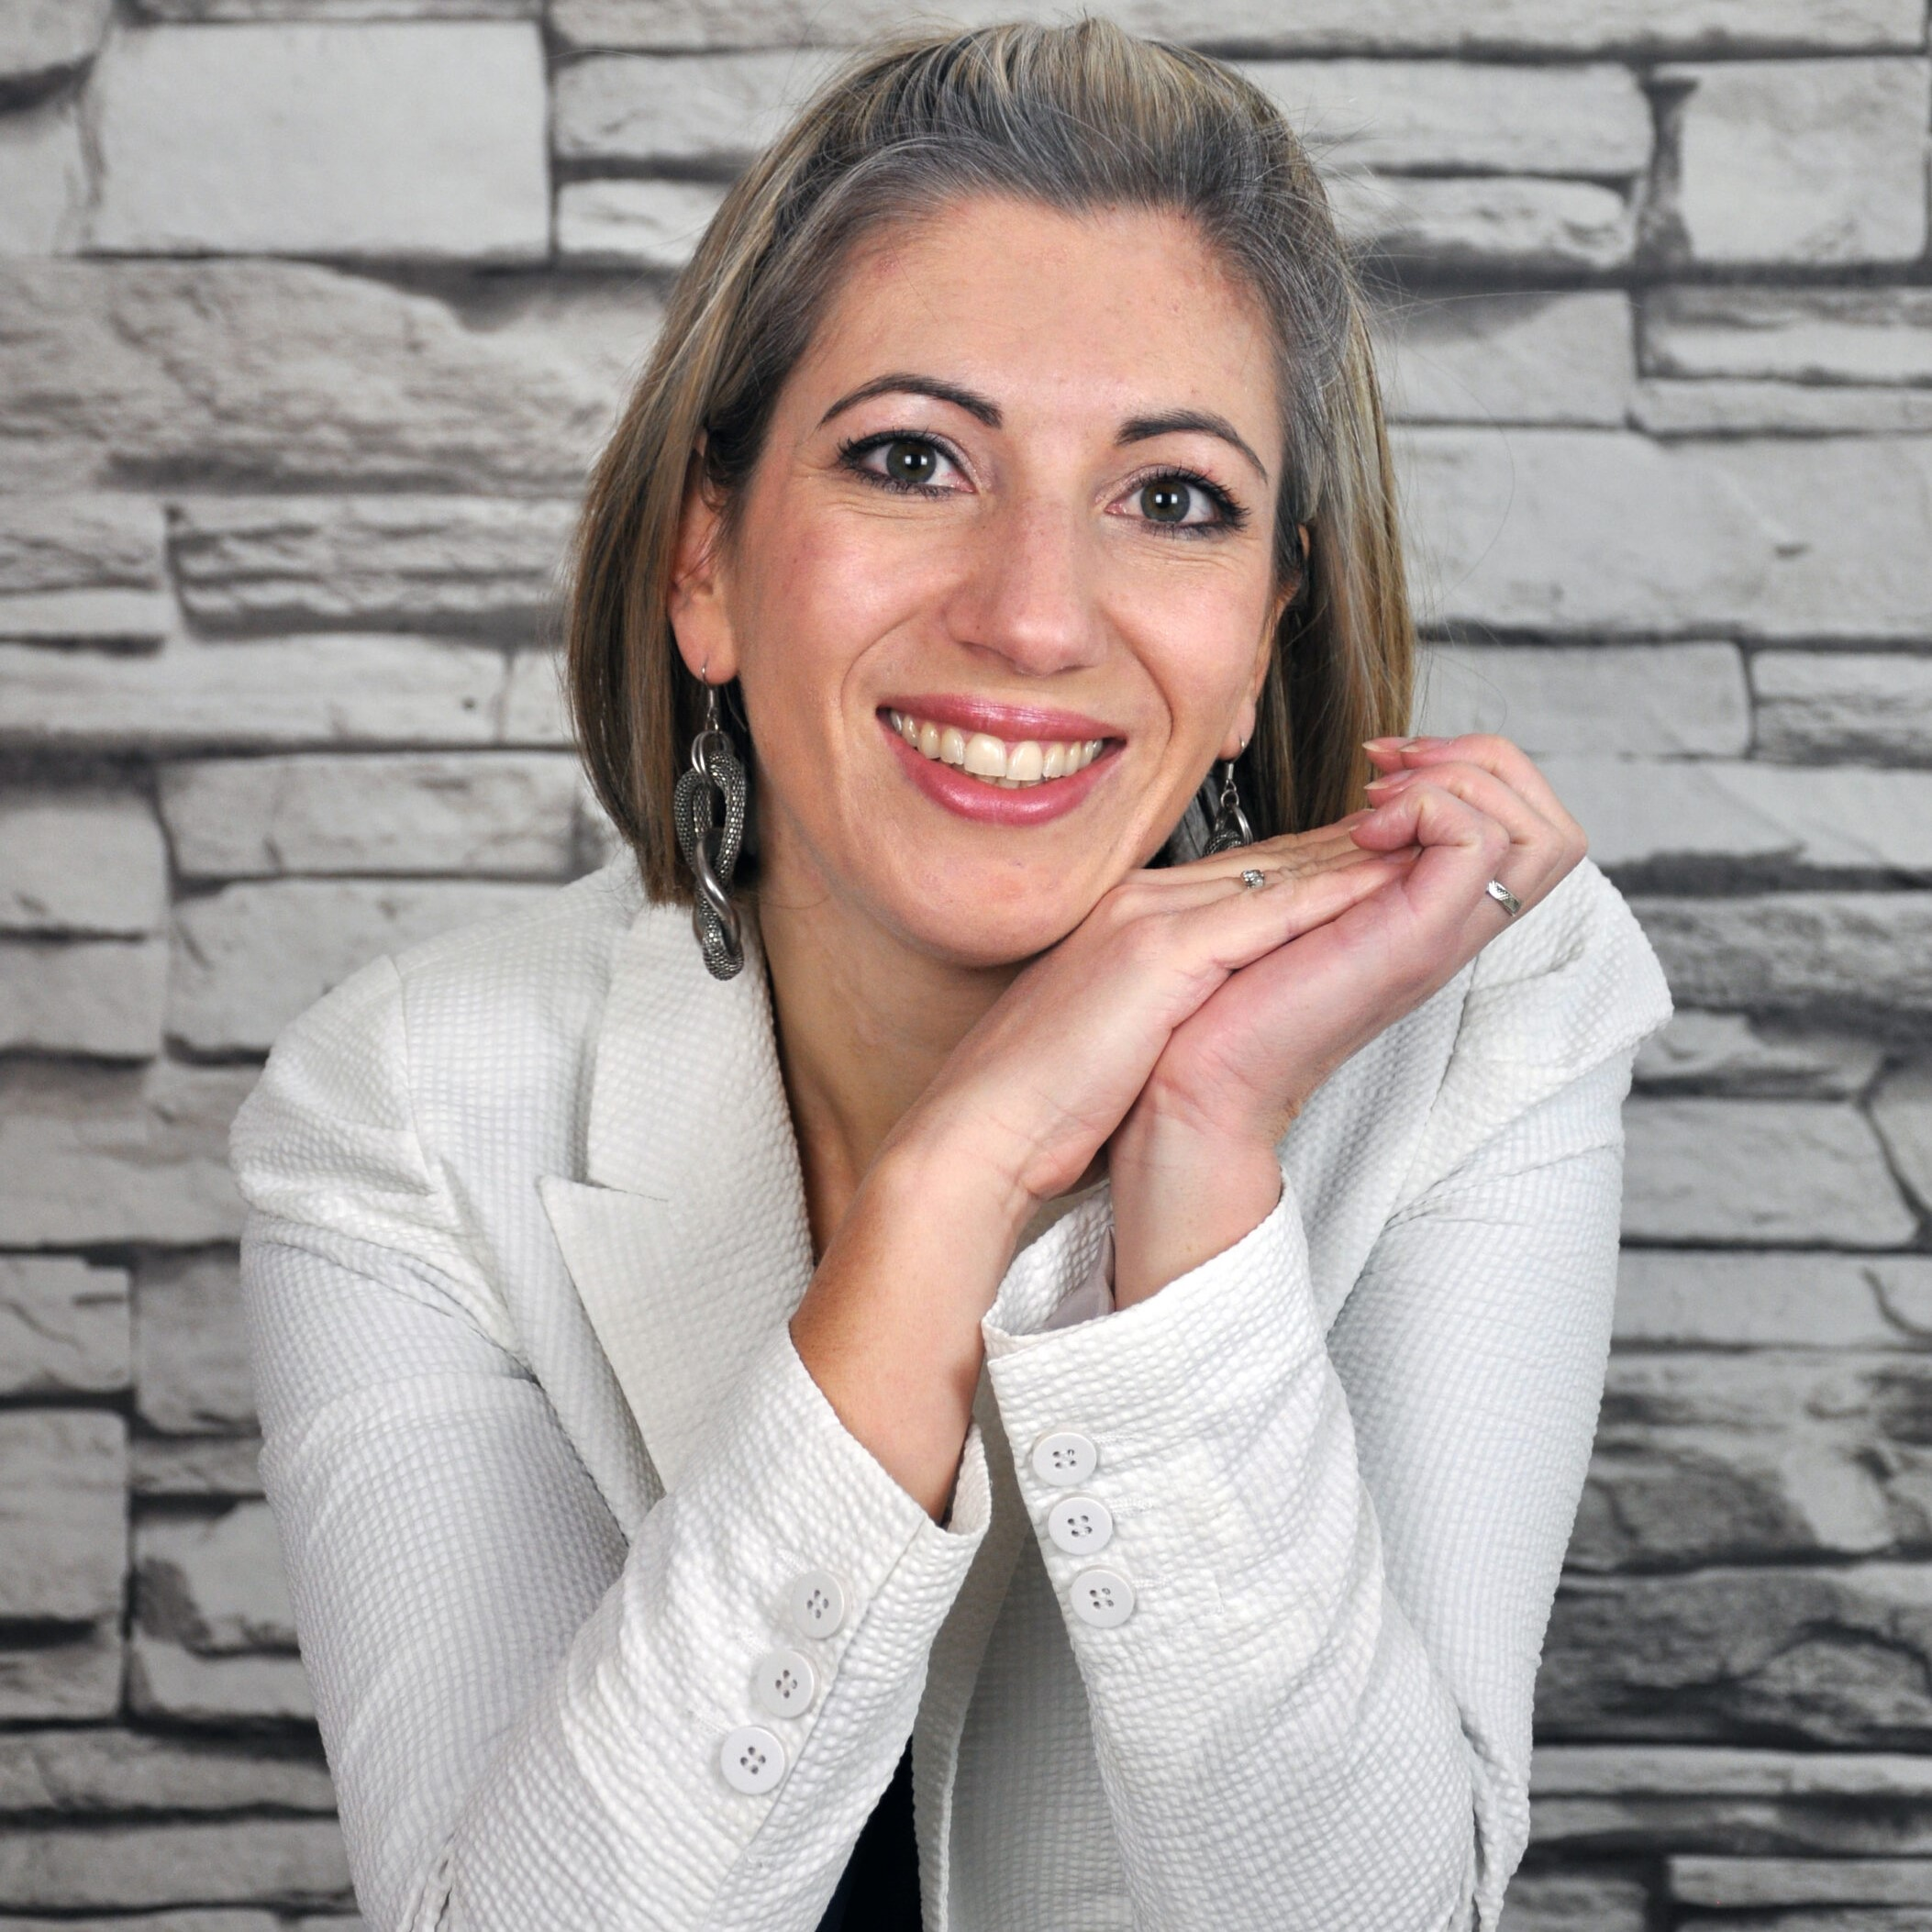 Anneli Eick2